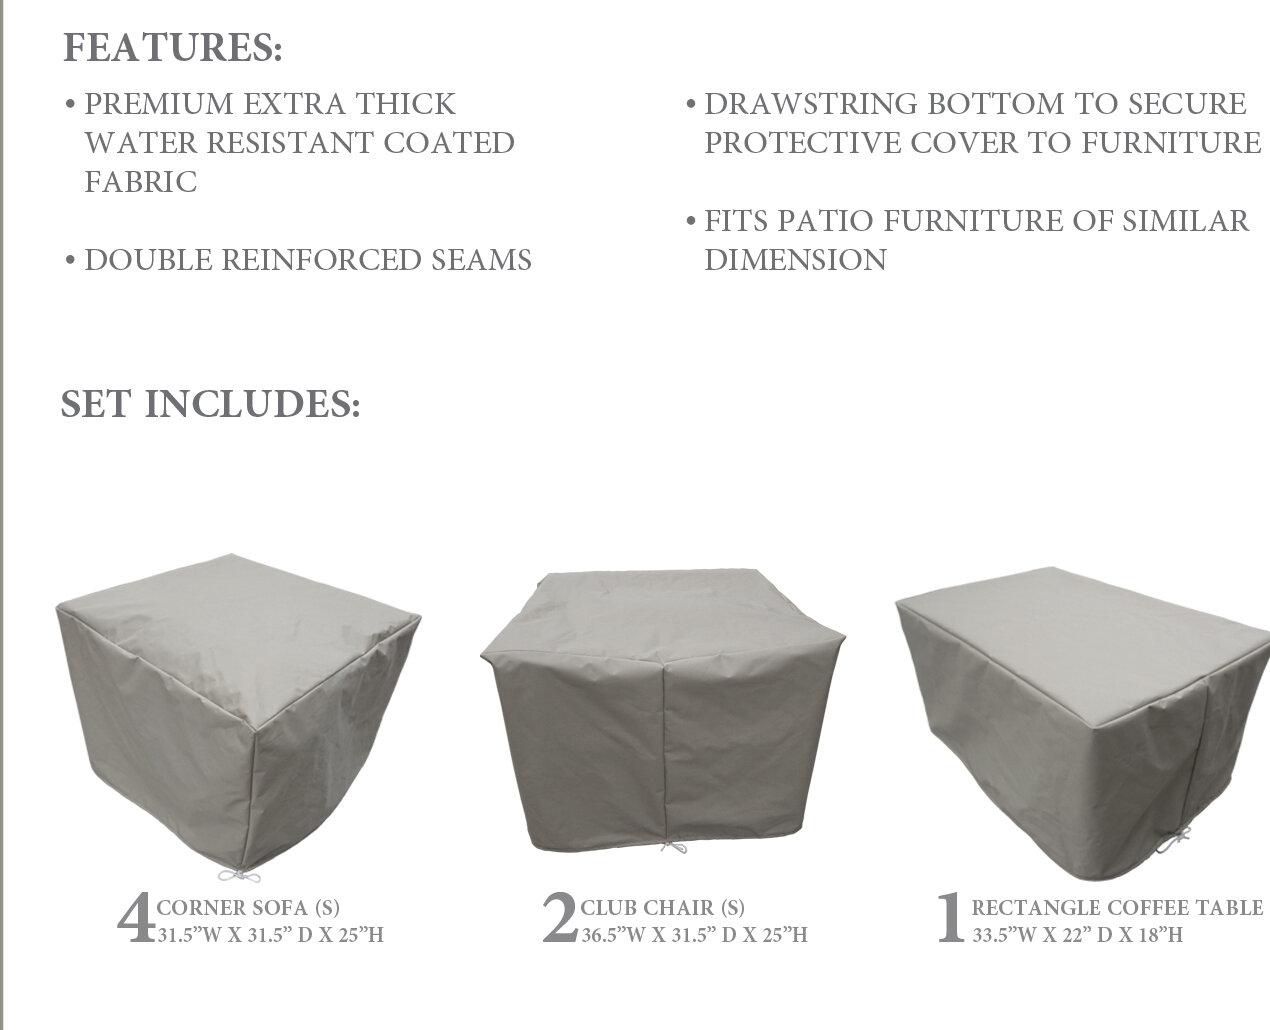 Wondrous Belle 7 Piece Patio Furniture Cover Set Download Free Architecture Designs Scobabritishbridgeorg